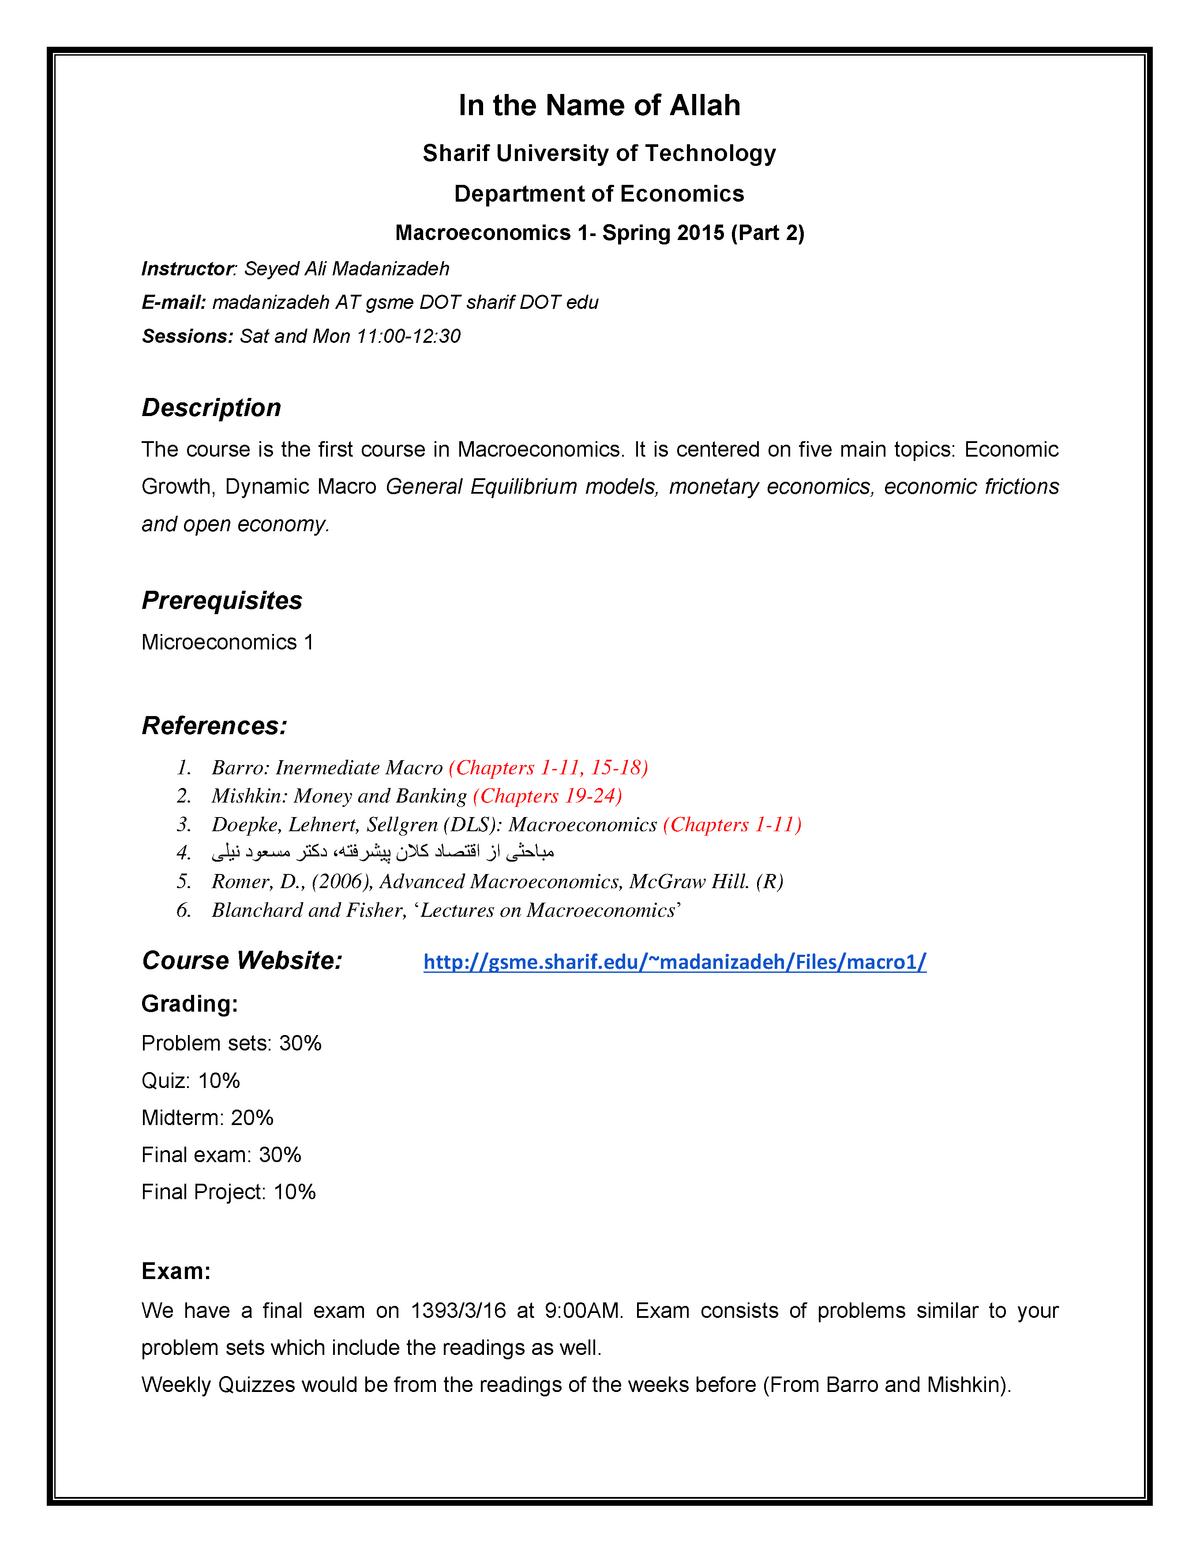 Syllabus Macro 1 - 20139 - StuDocu